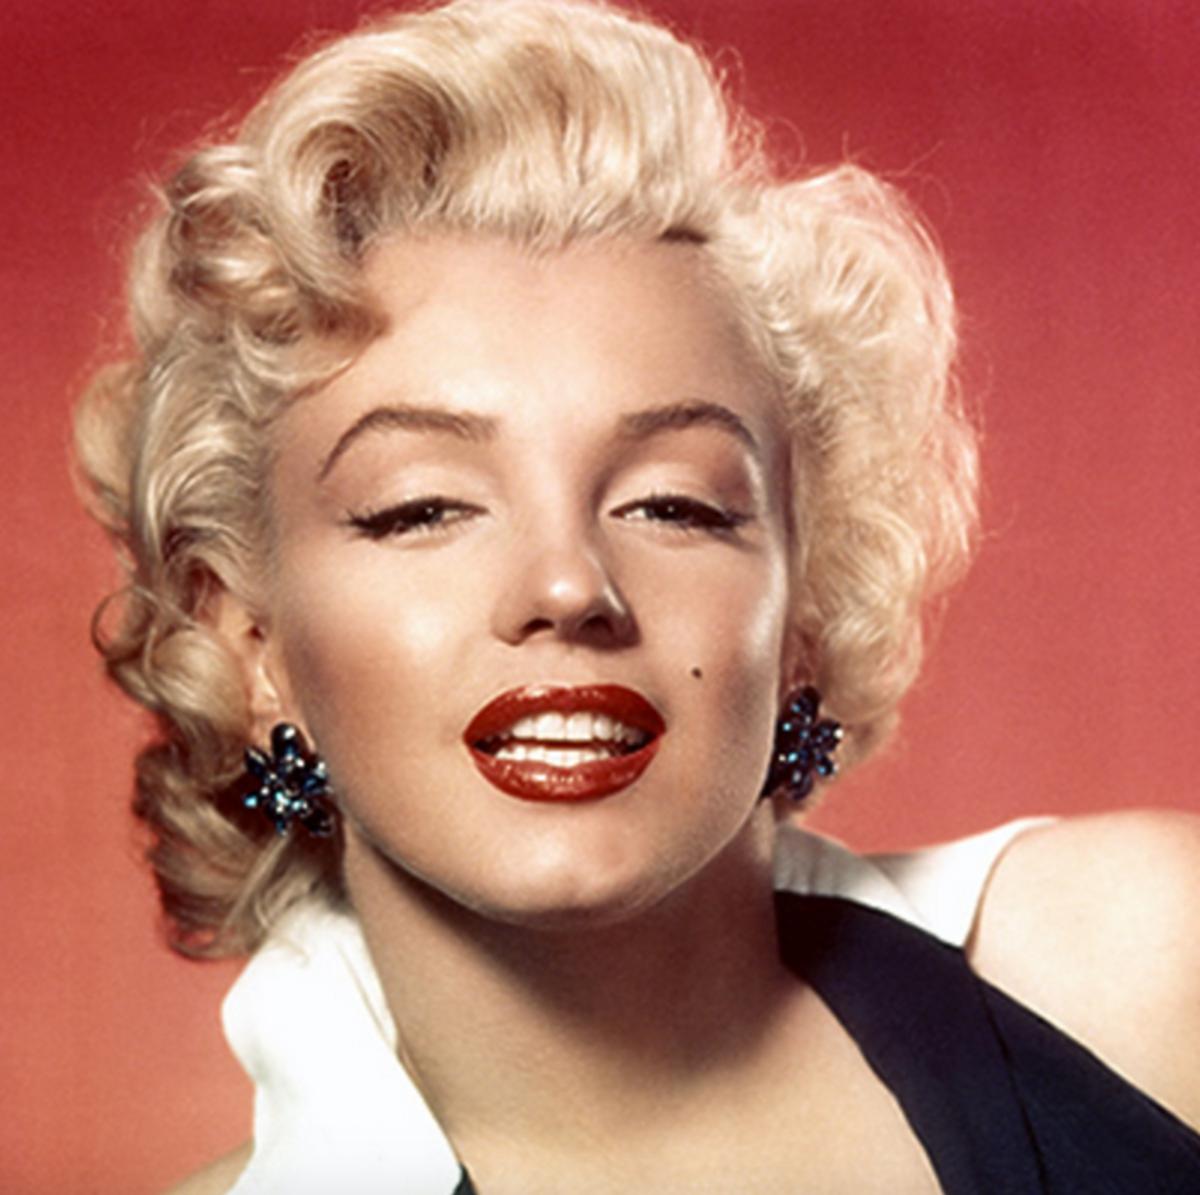 Marilyn Monroe, biography.com